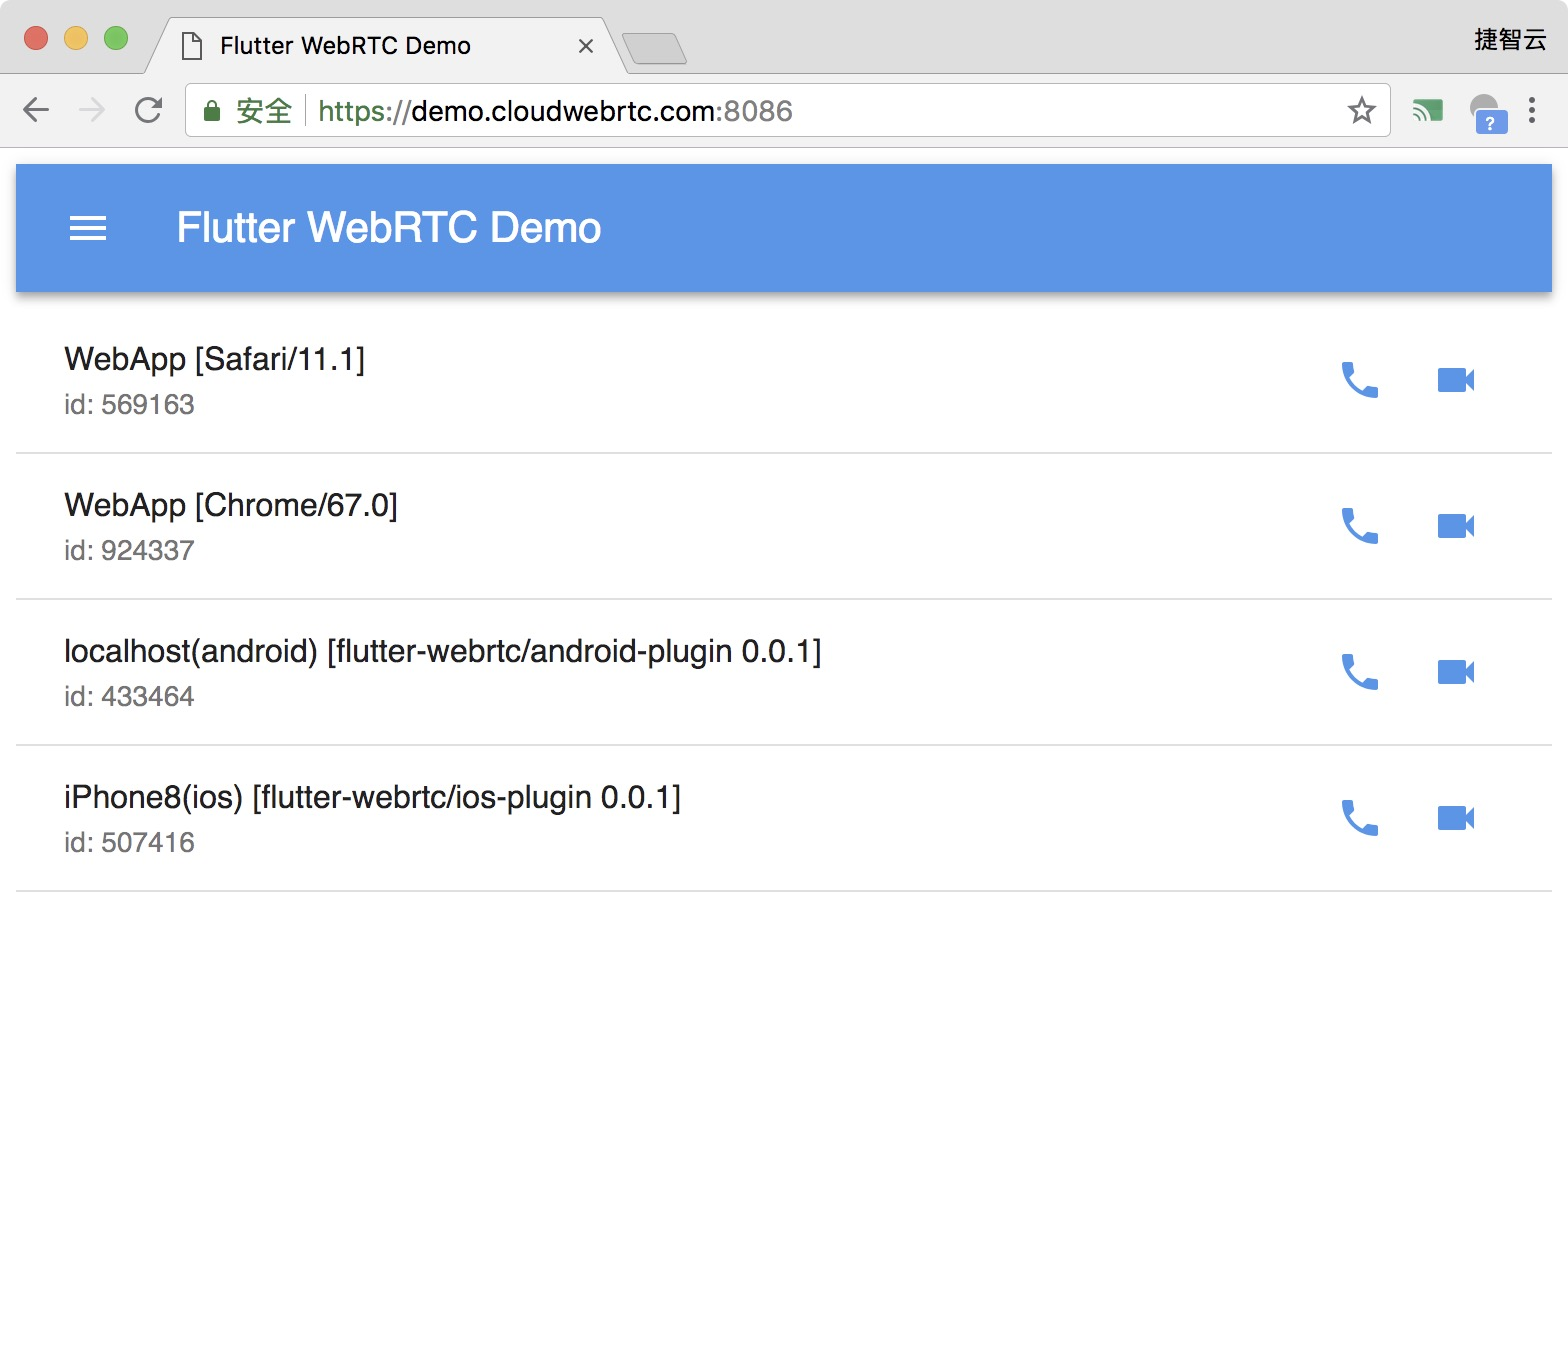 flutter-webrtc-server/README md at master · cloudwebrtc